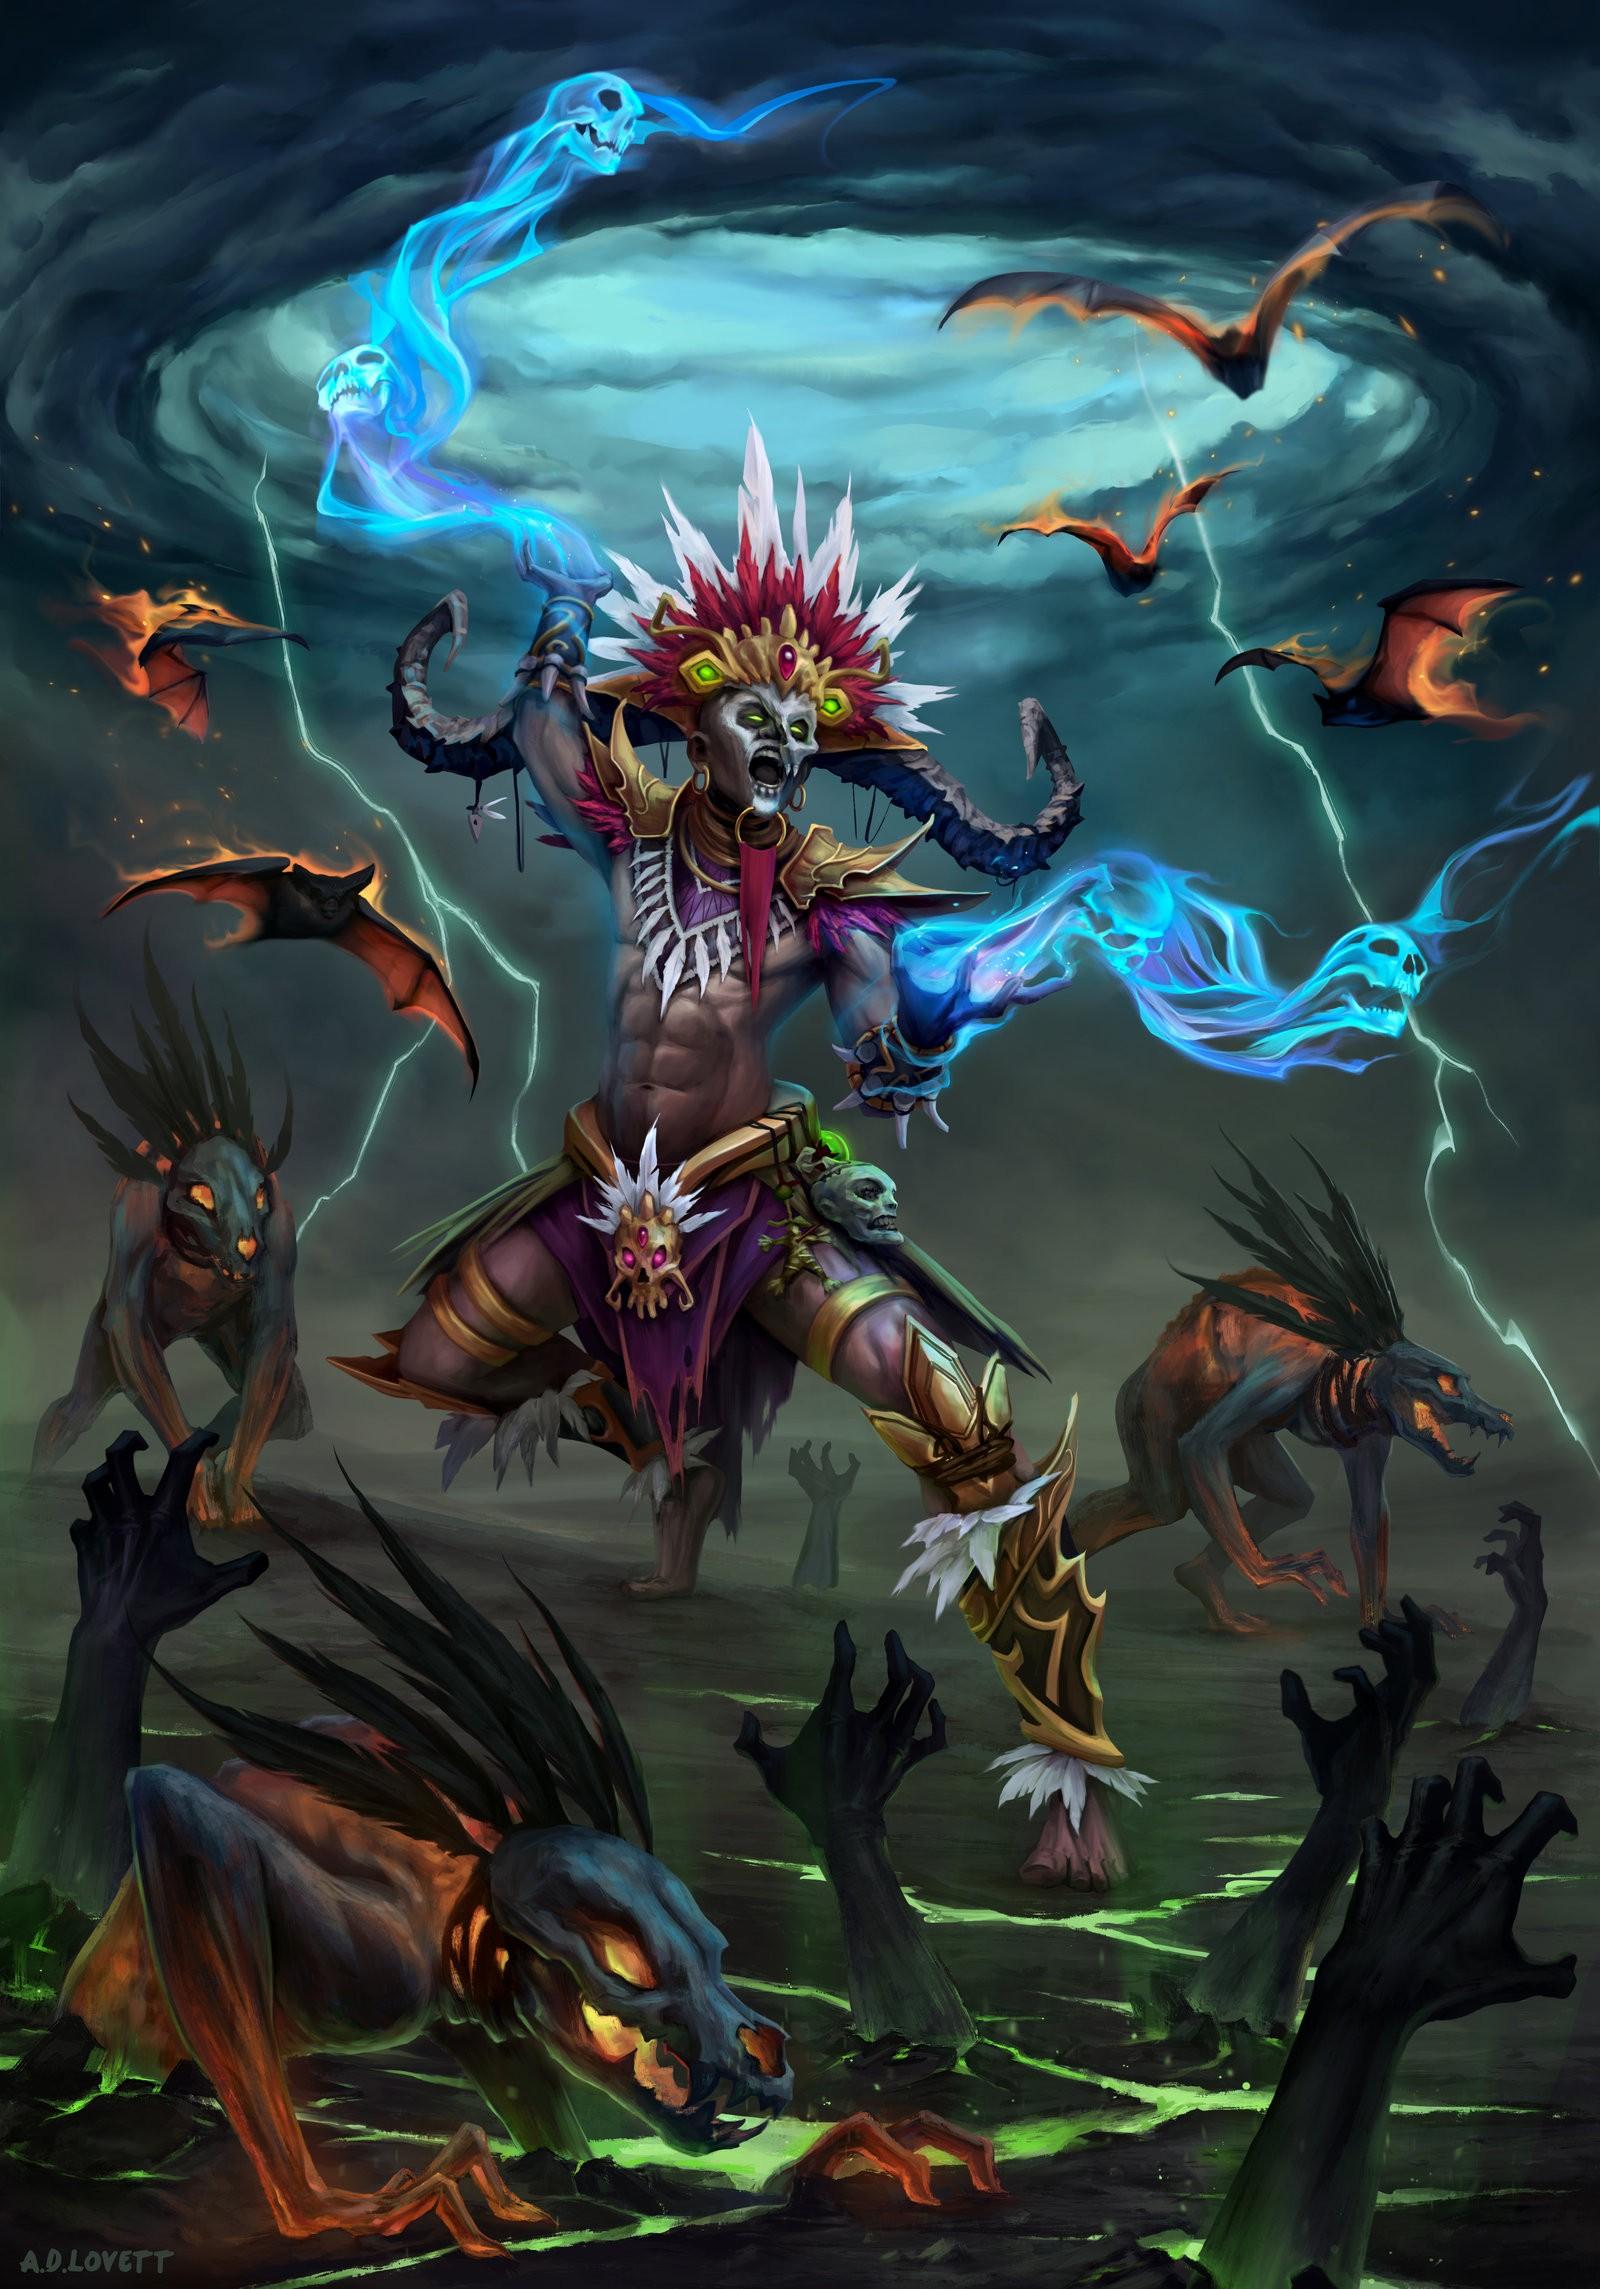 Illustration Anime Diablo III Mythology 3 Reaper Of Souls Witch Doctor Screenshot Computer Wallpaper